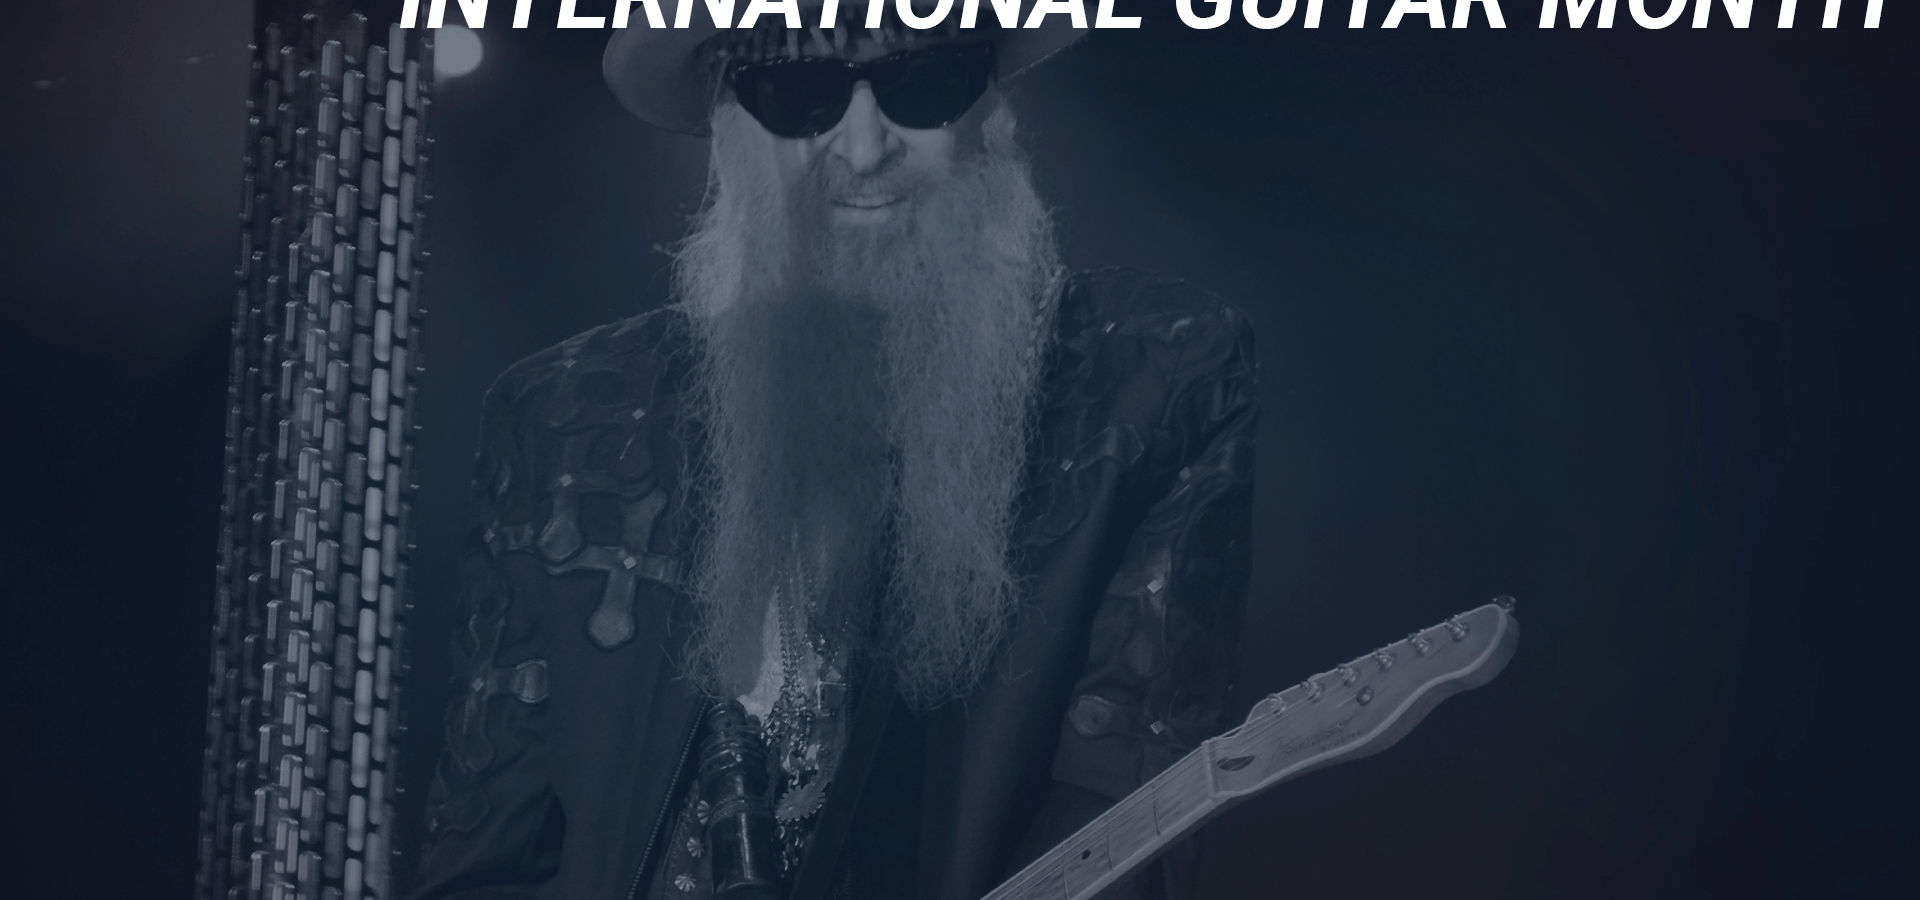 International Guitar Month